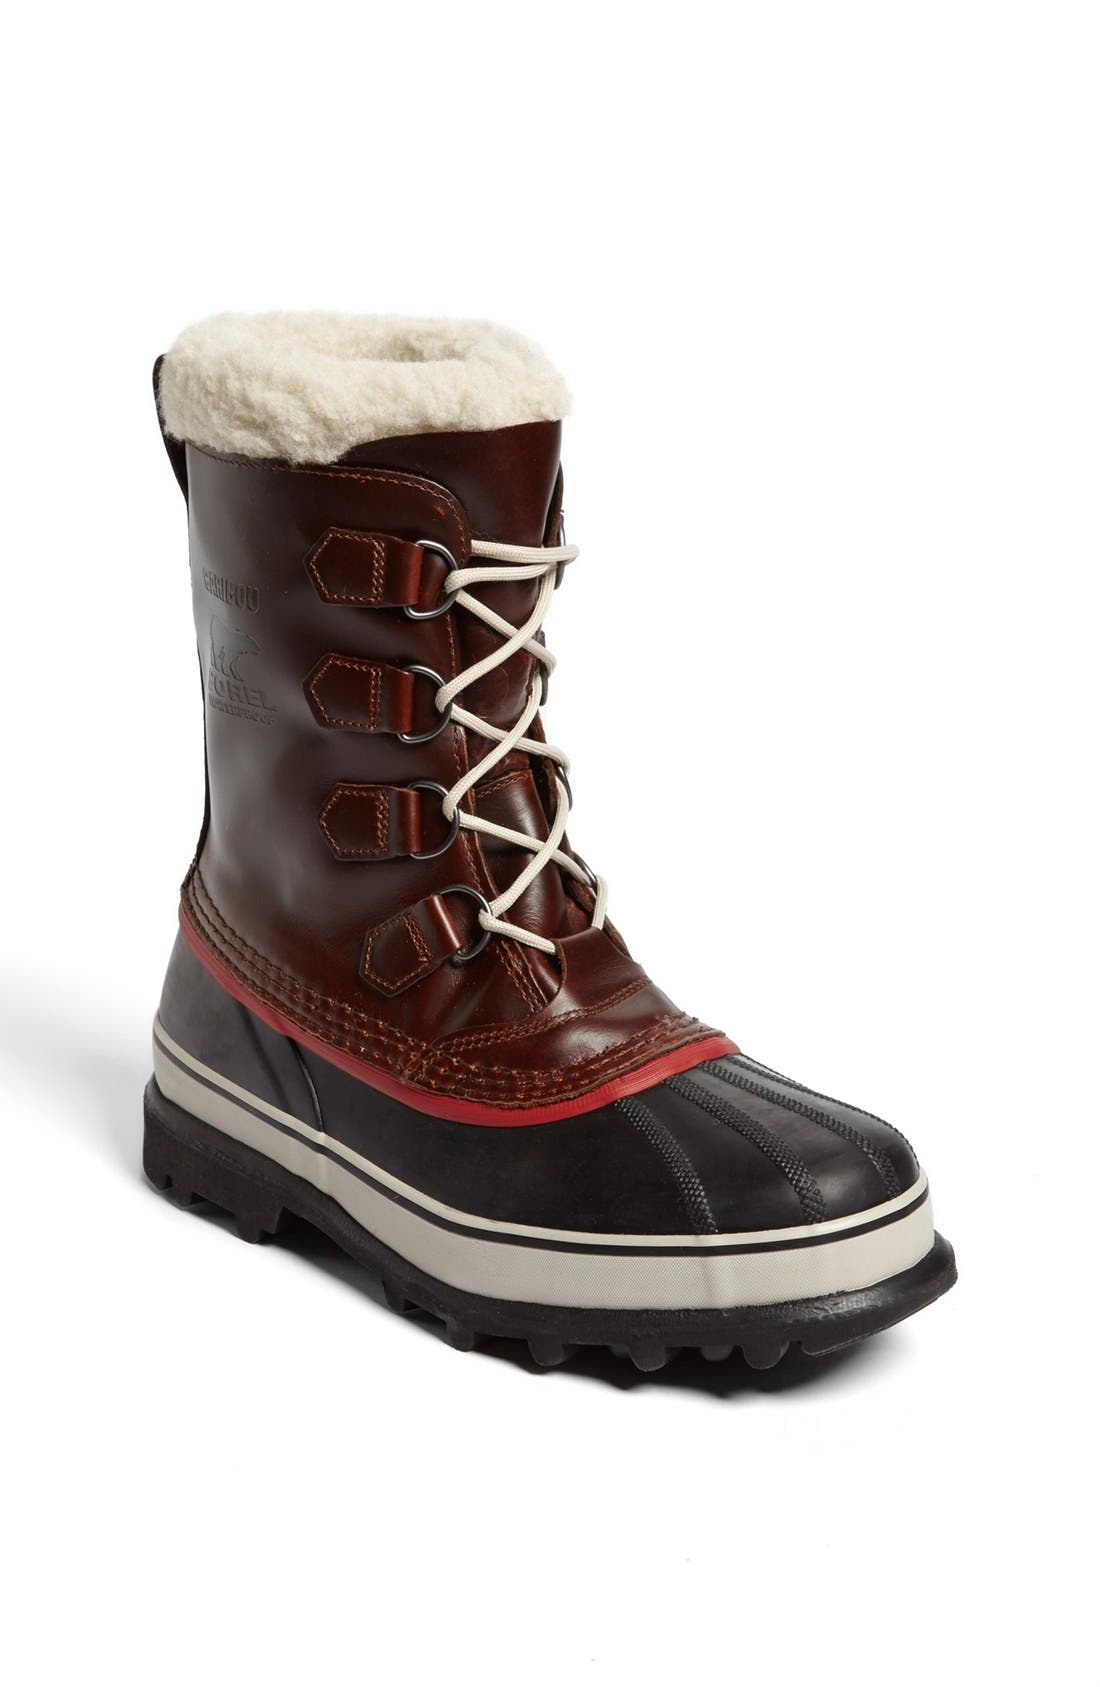 SOREL, 'Caribou' Snow Boot, Main thumbnail 1, color, 219